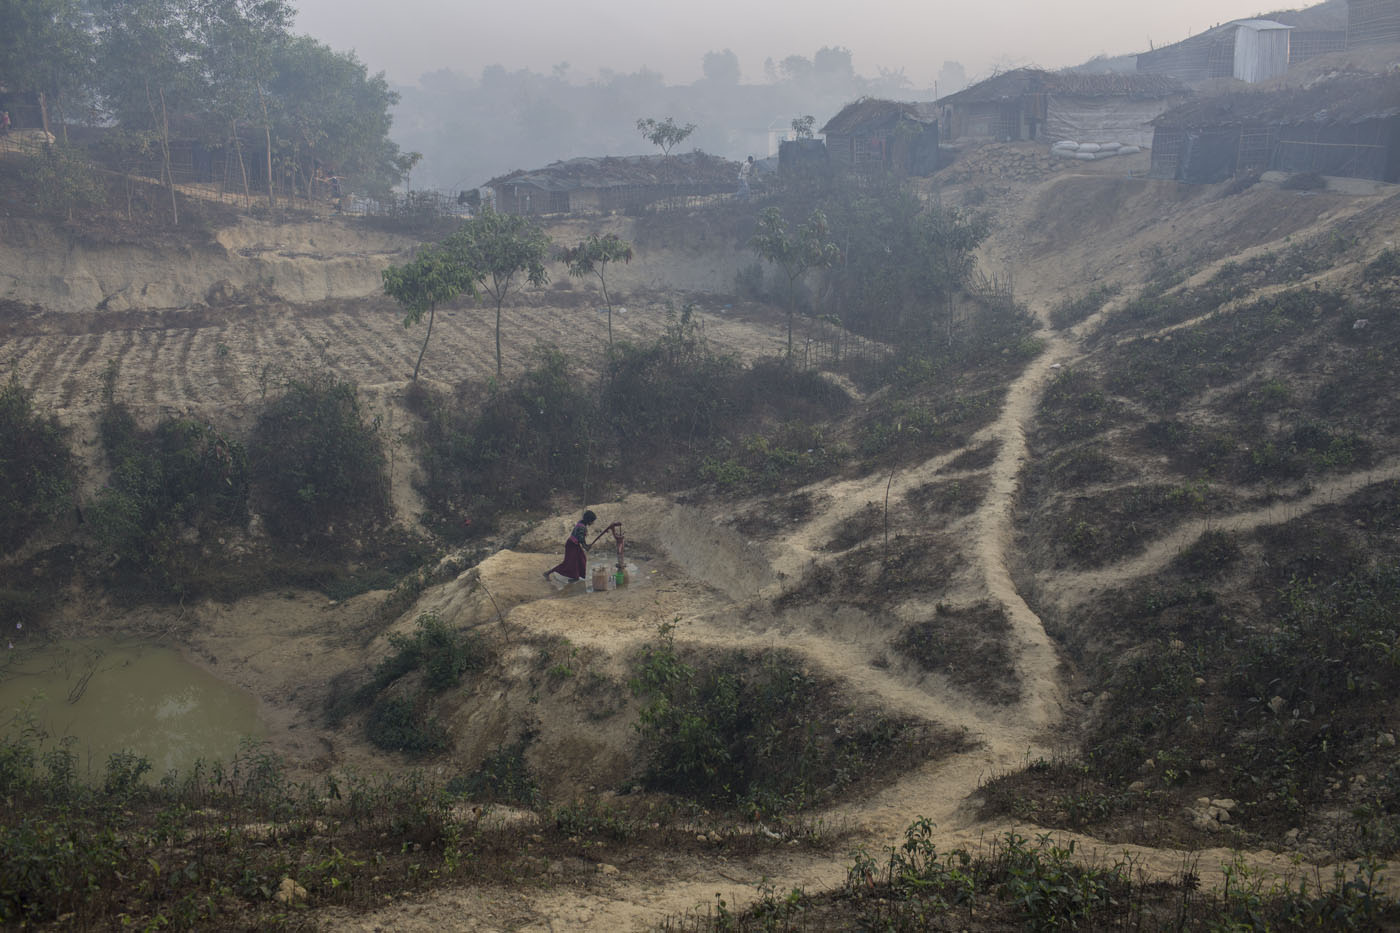 Probal Rashid_Bangladesh_The Rohingyas-A People Without A Home_13.jpg